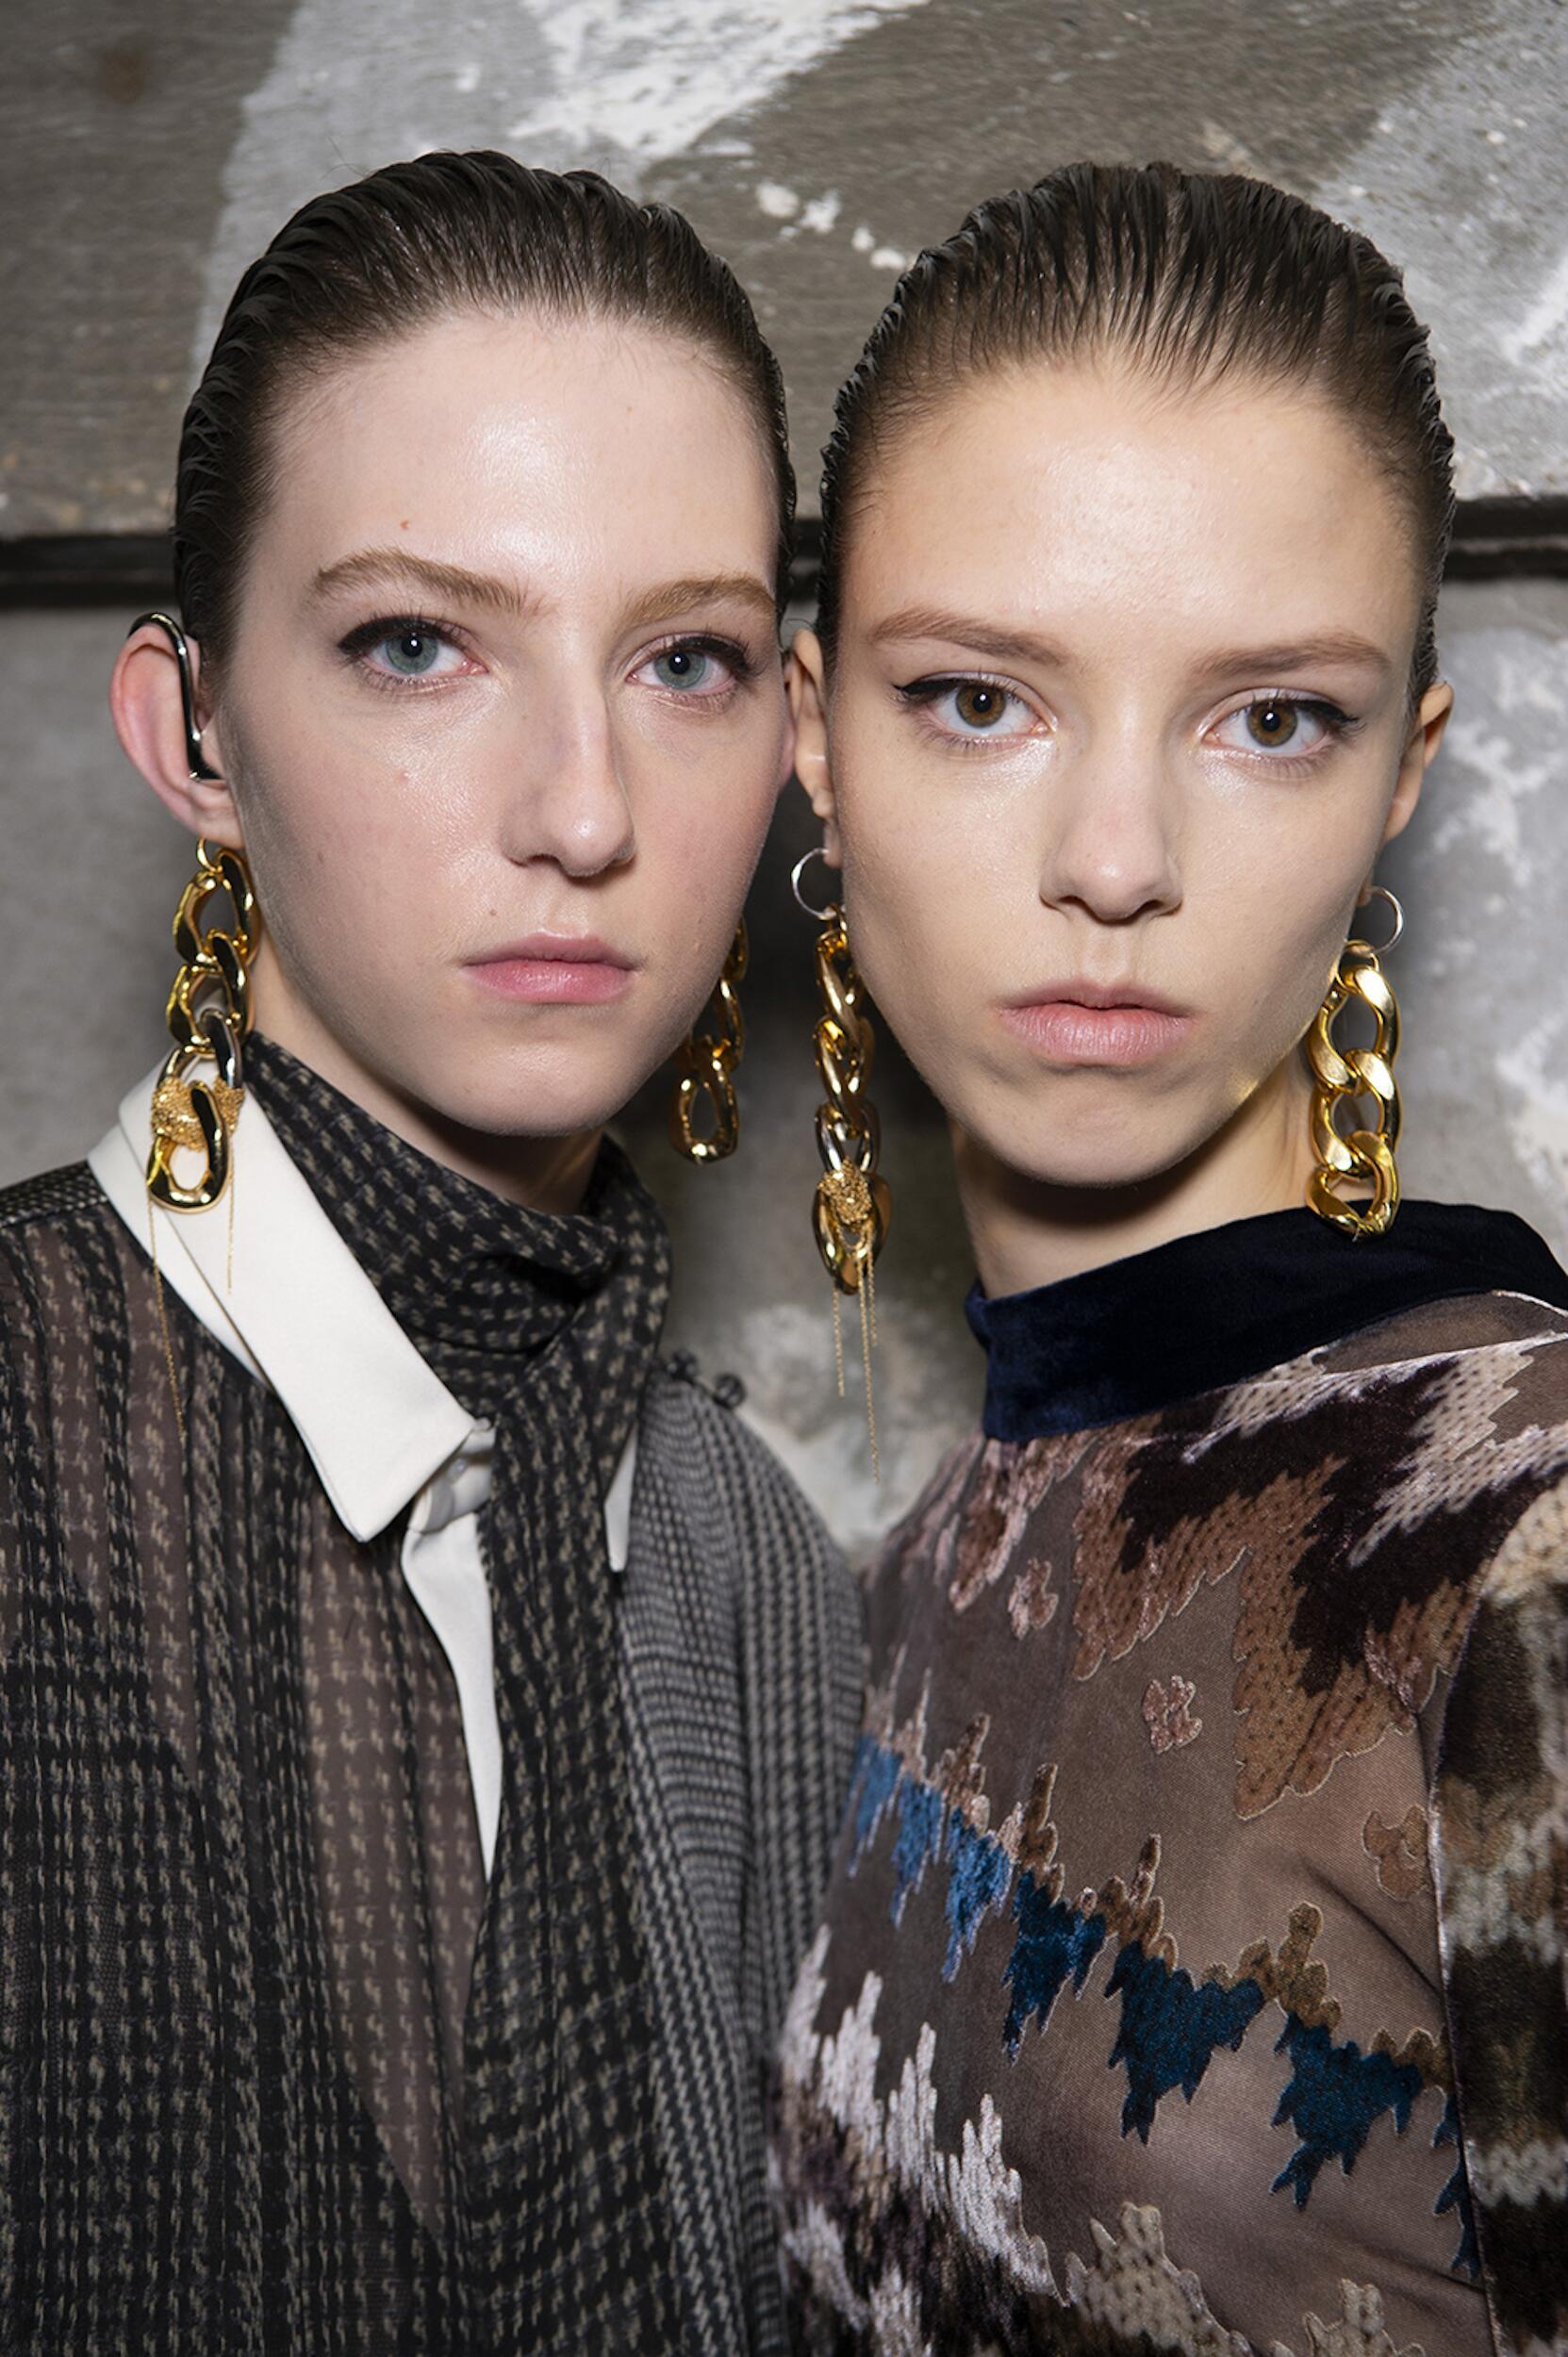 Portrait Models Backstage Sacai Fall Winter 2020 Women's Collection Paris Fashion Week